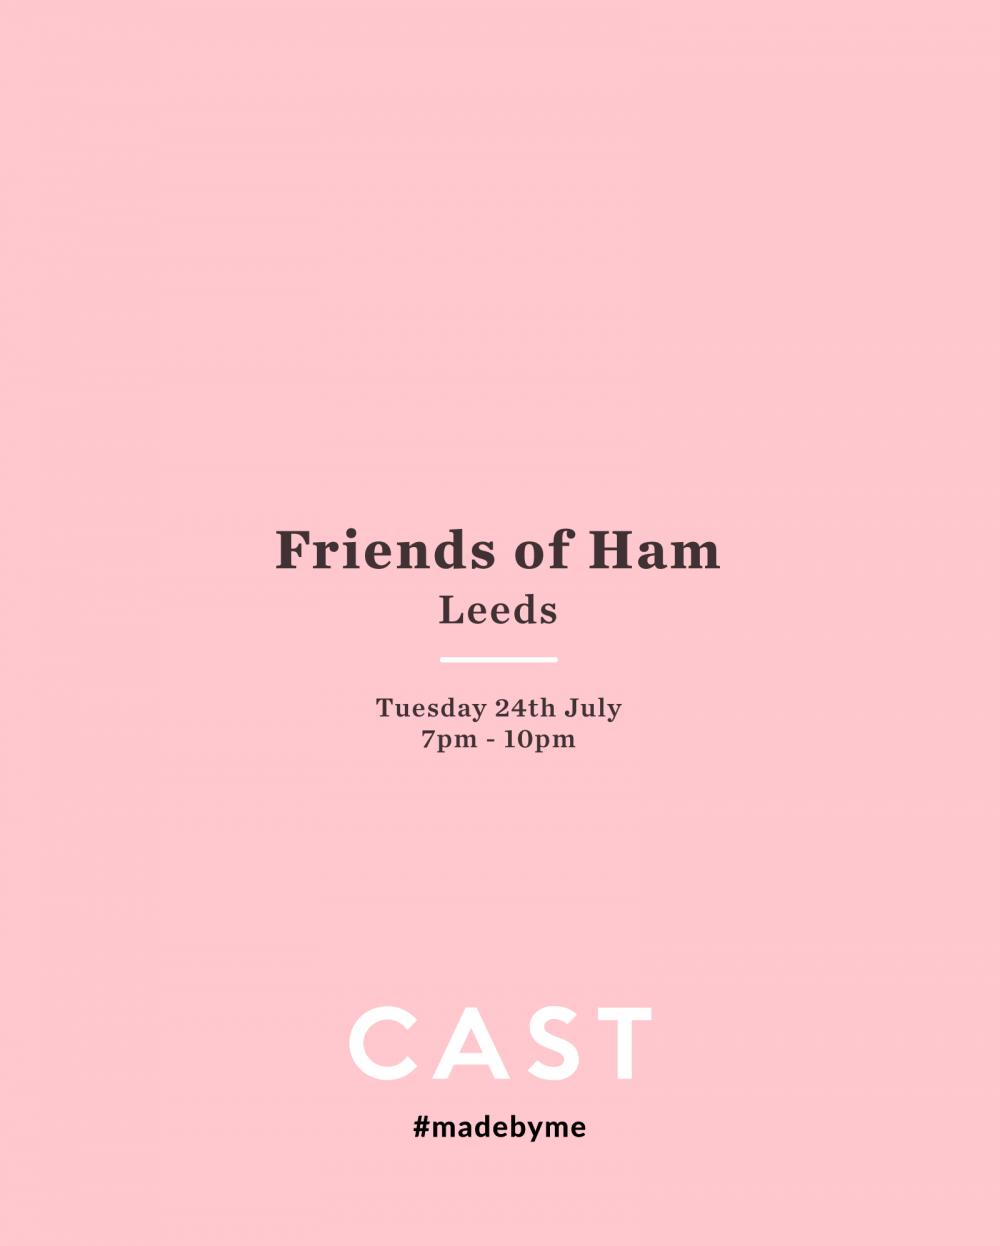 CAST x Friends of Ham, Leeds: Tue 24th July - Bespoke Jewellery Making